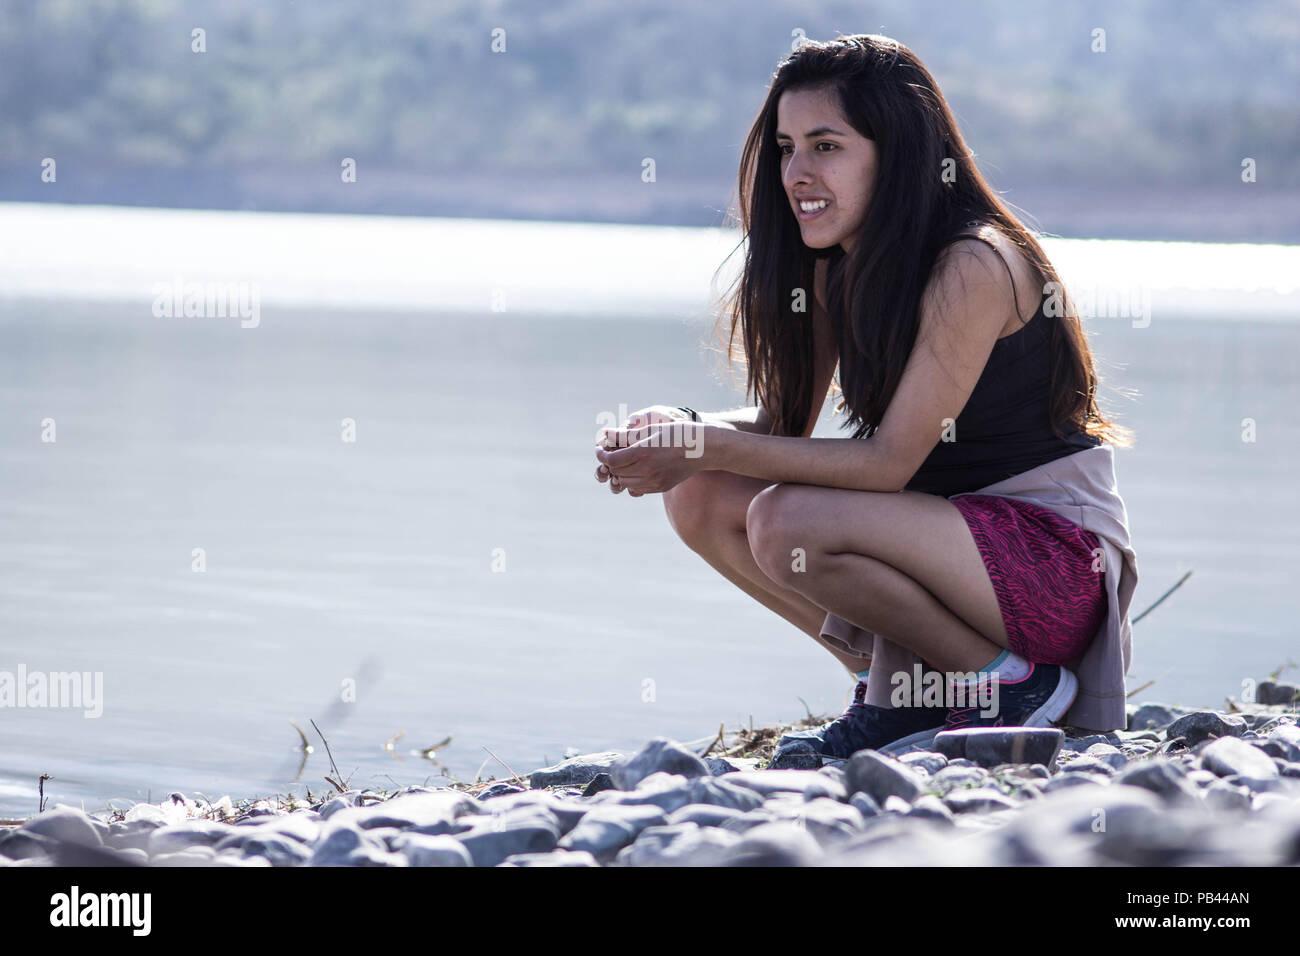 girl possing in lake - Stock Image